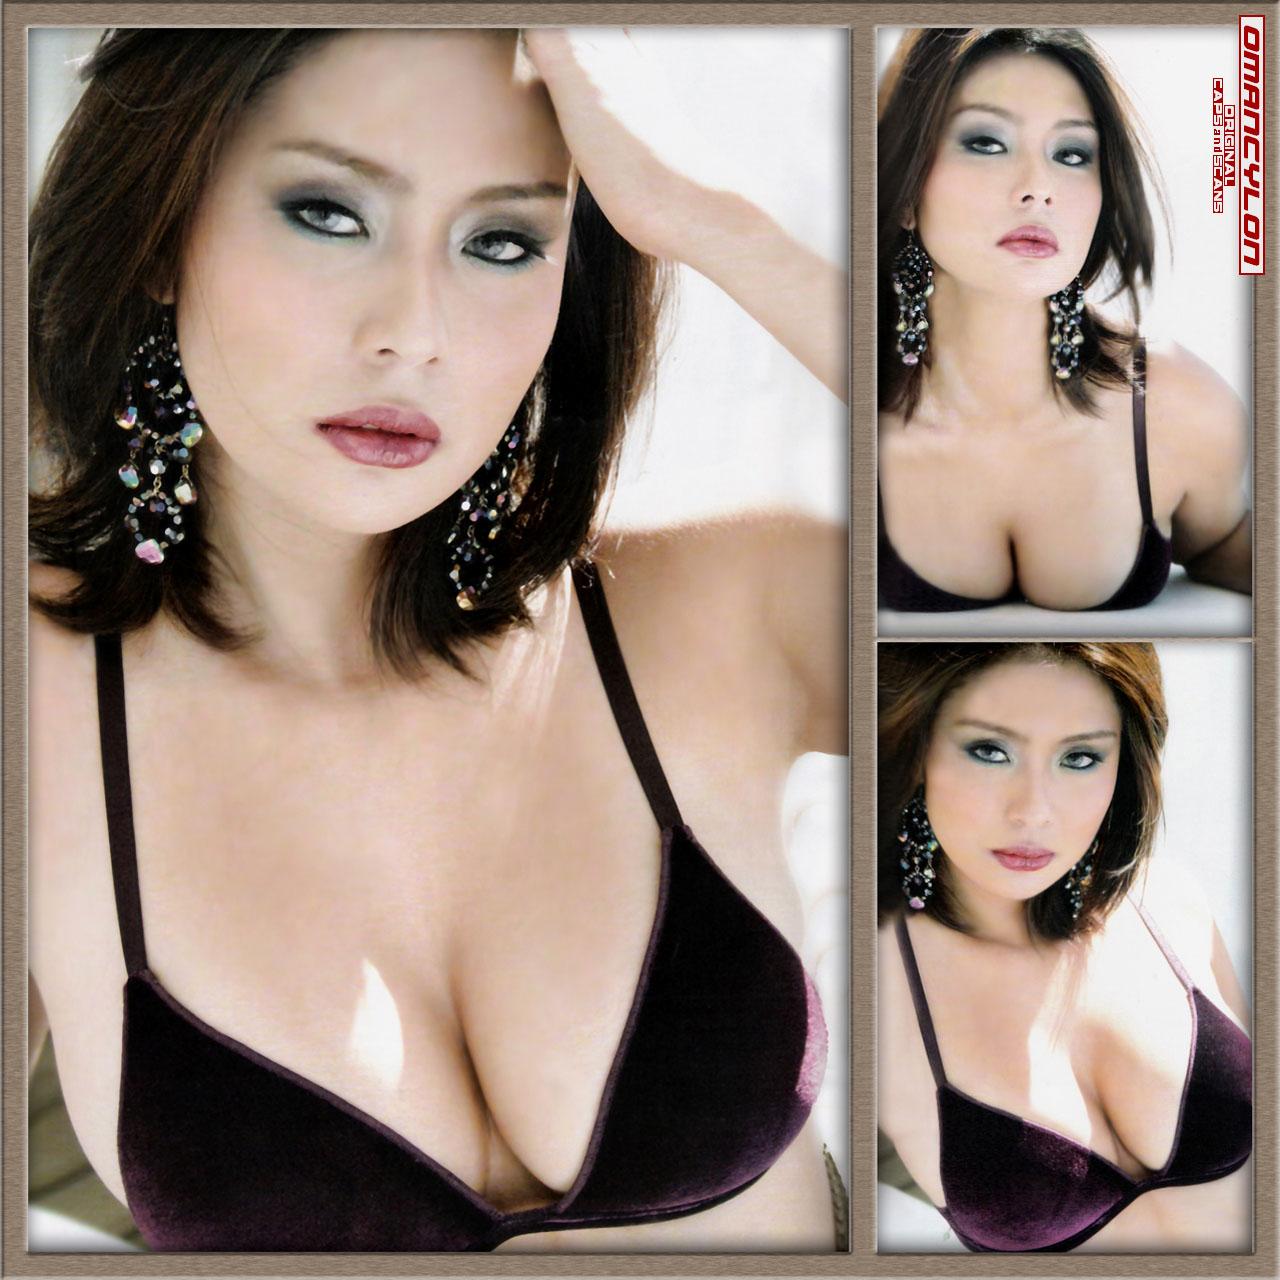 http://2.bp.blogspot.com/-5KSBFRnJDh8/Ta2bfAsOtlI/AAAAAAAAFk4/lGSrL7r2KPA/s1600/iwa5.jpg